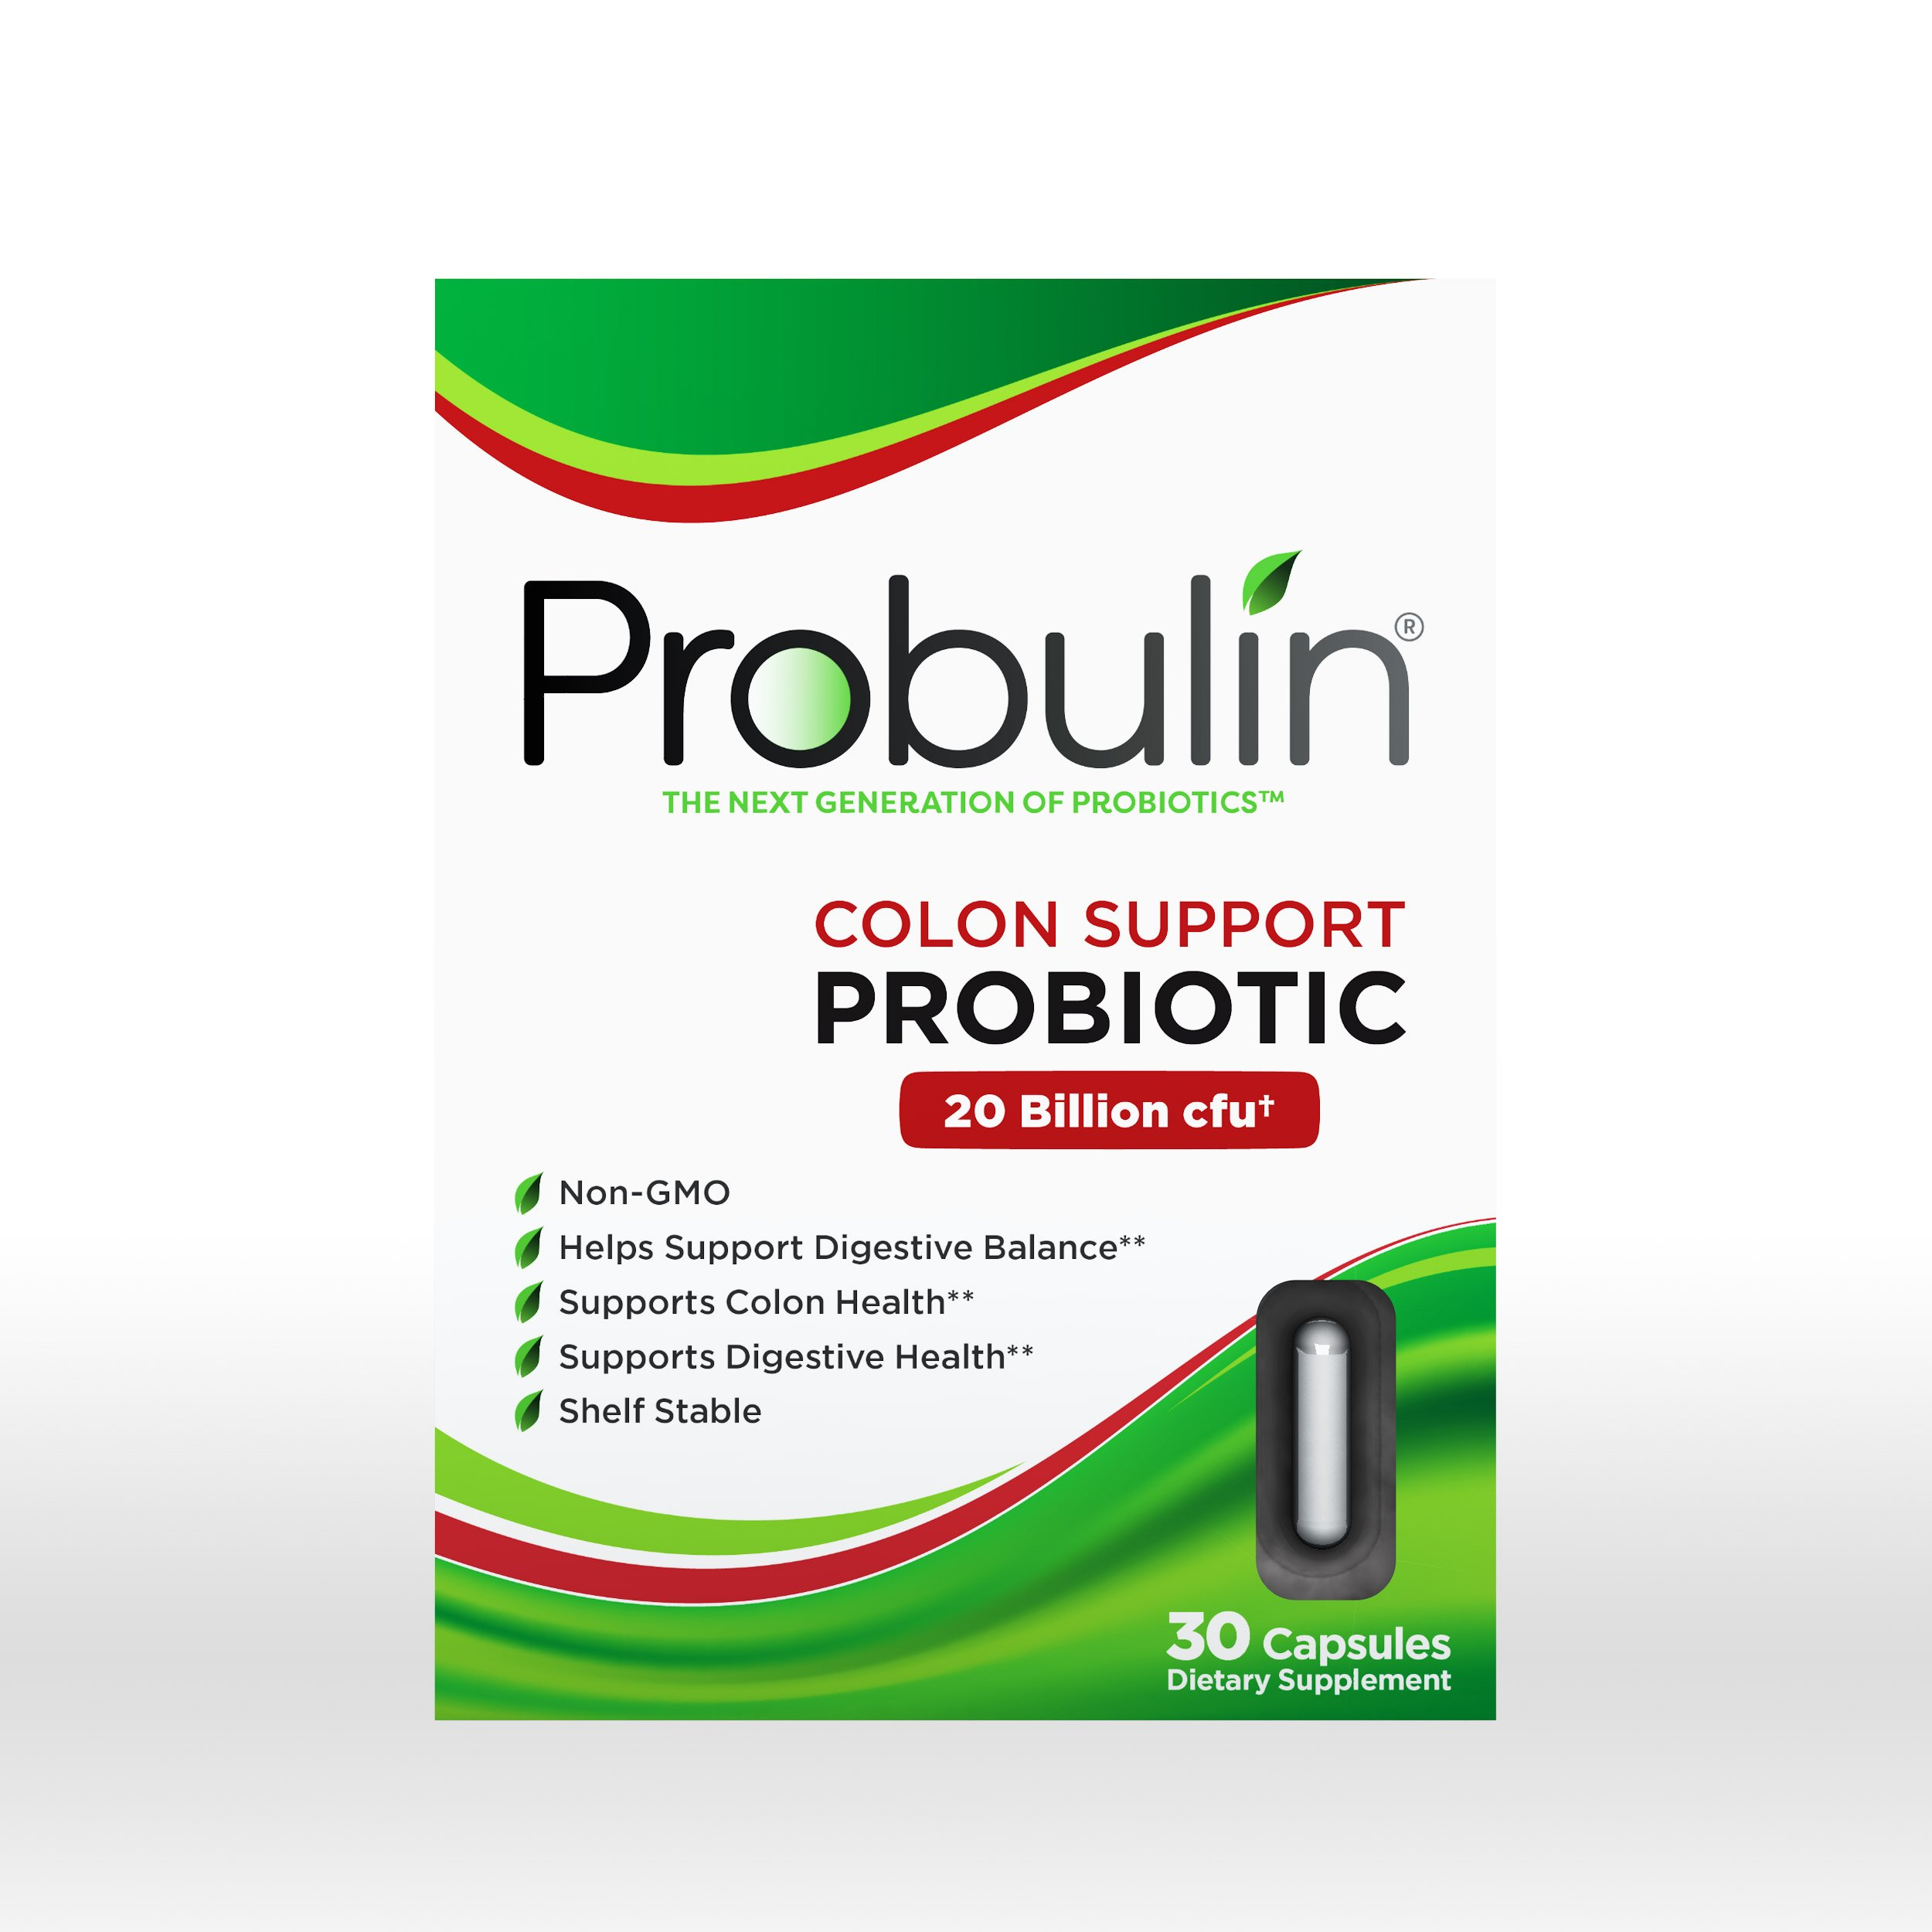 Probulin Colon Support Probiotic, 30 Capsules